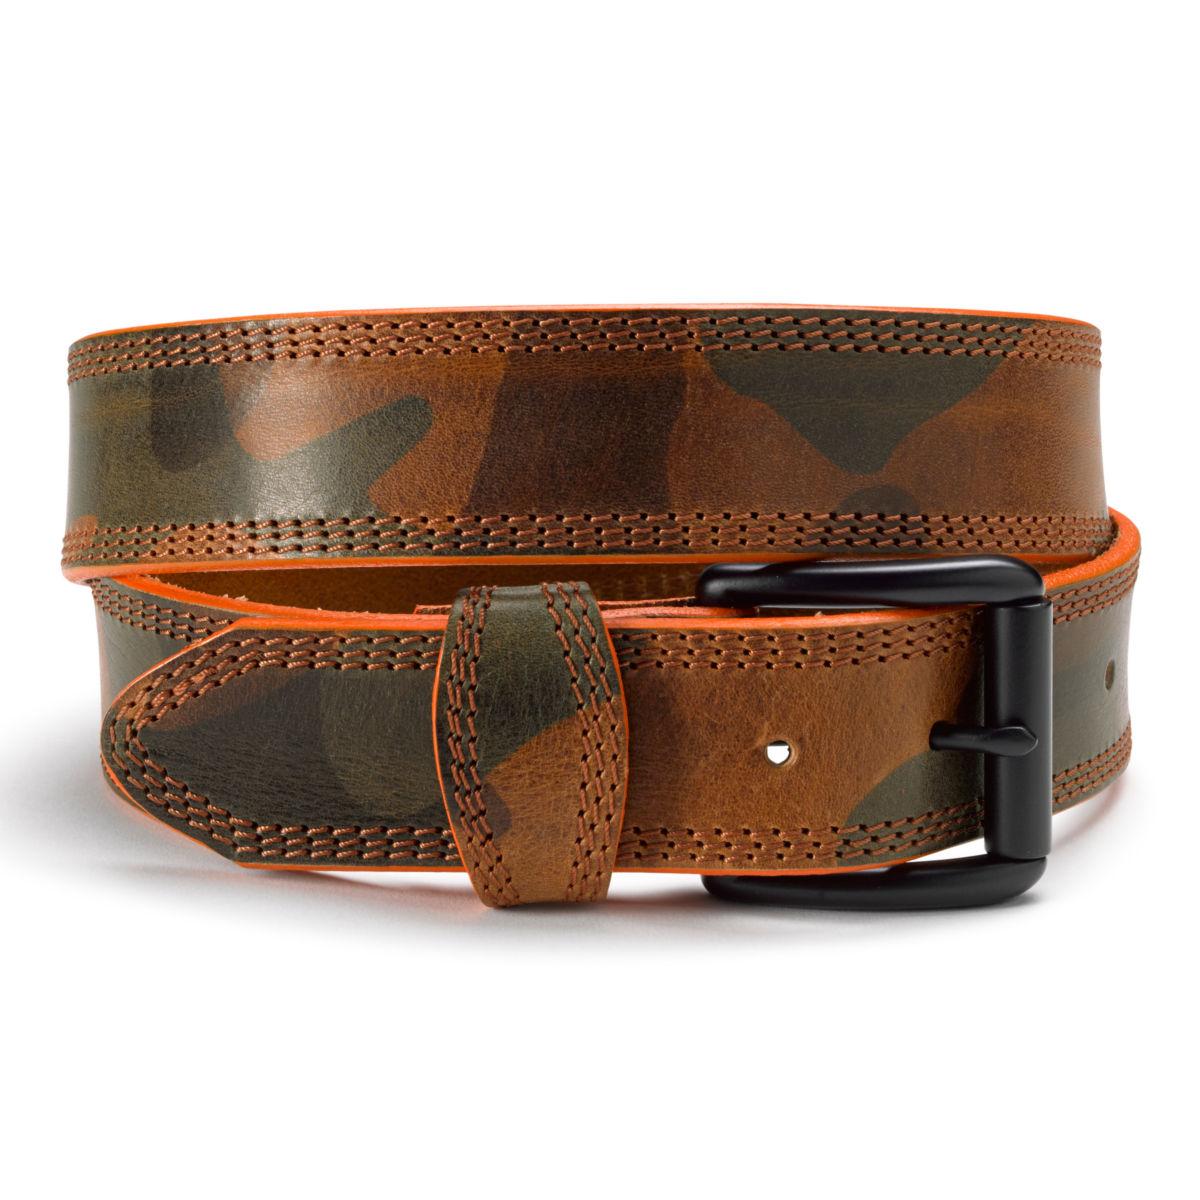 Camo Leather Belt - CAMOimage number 0